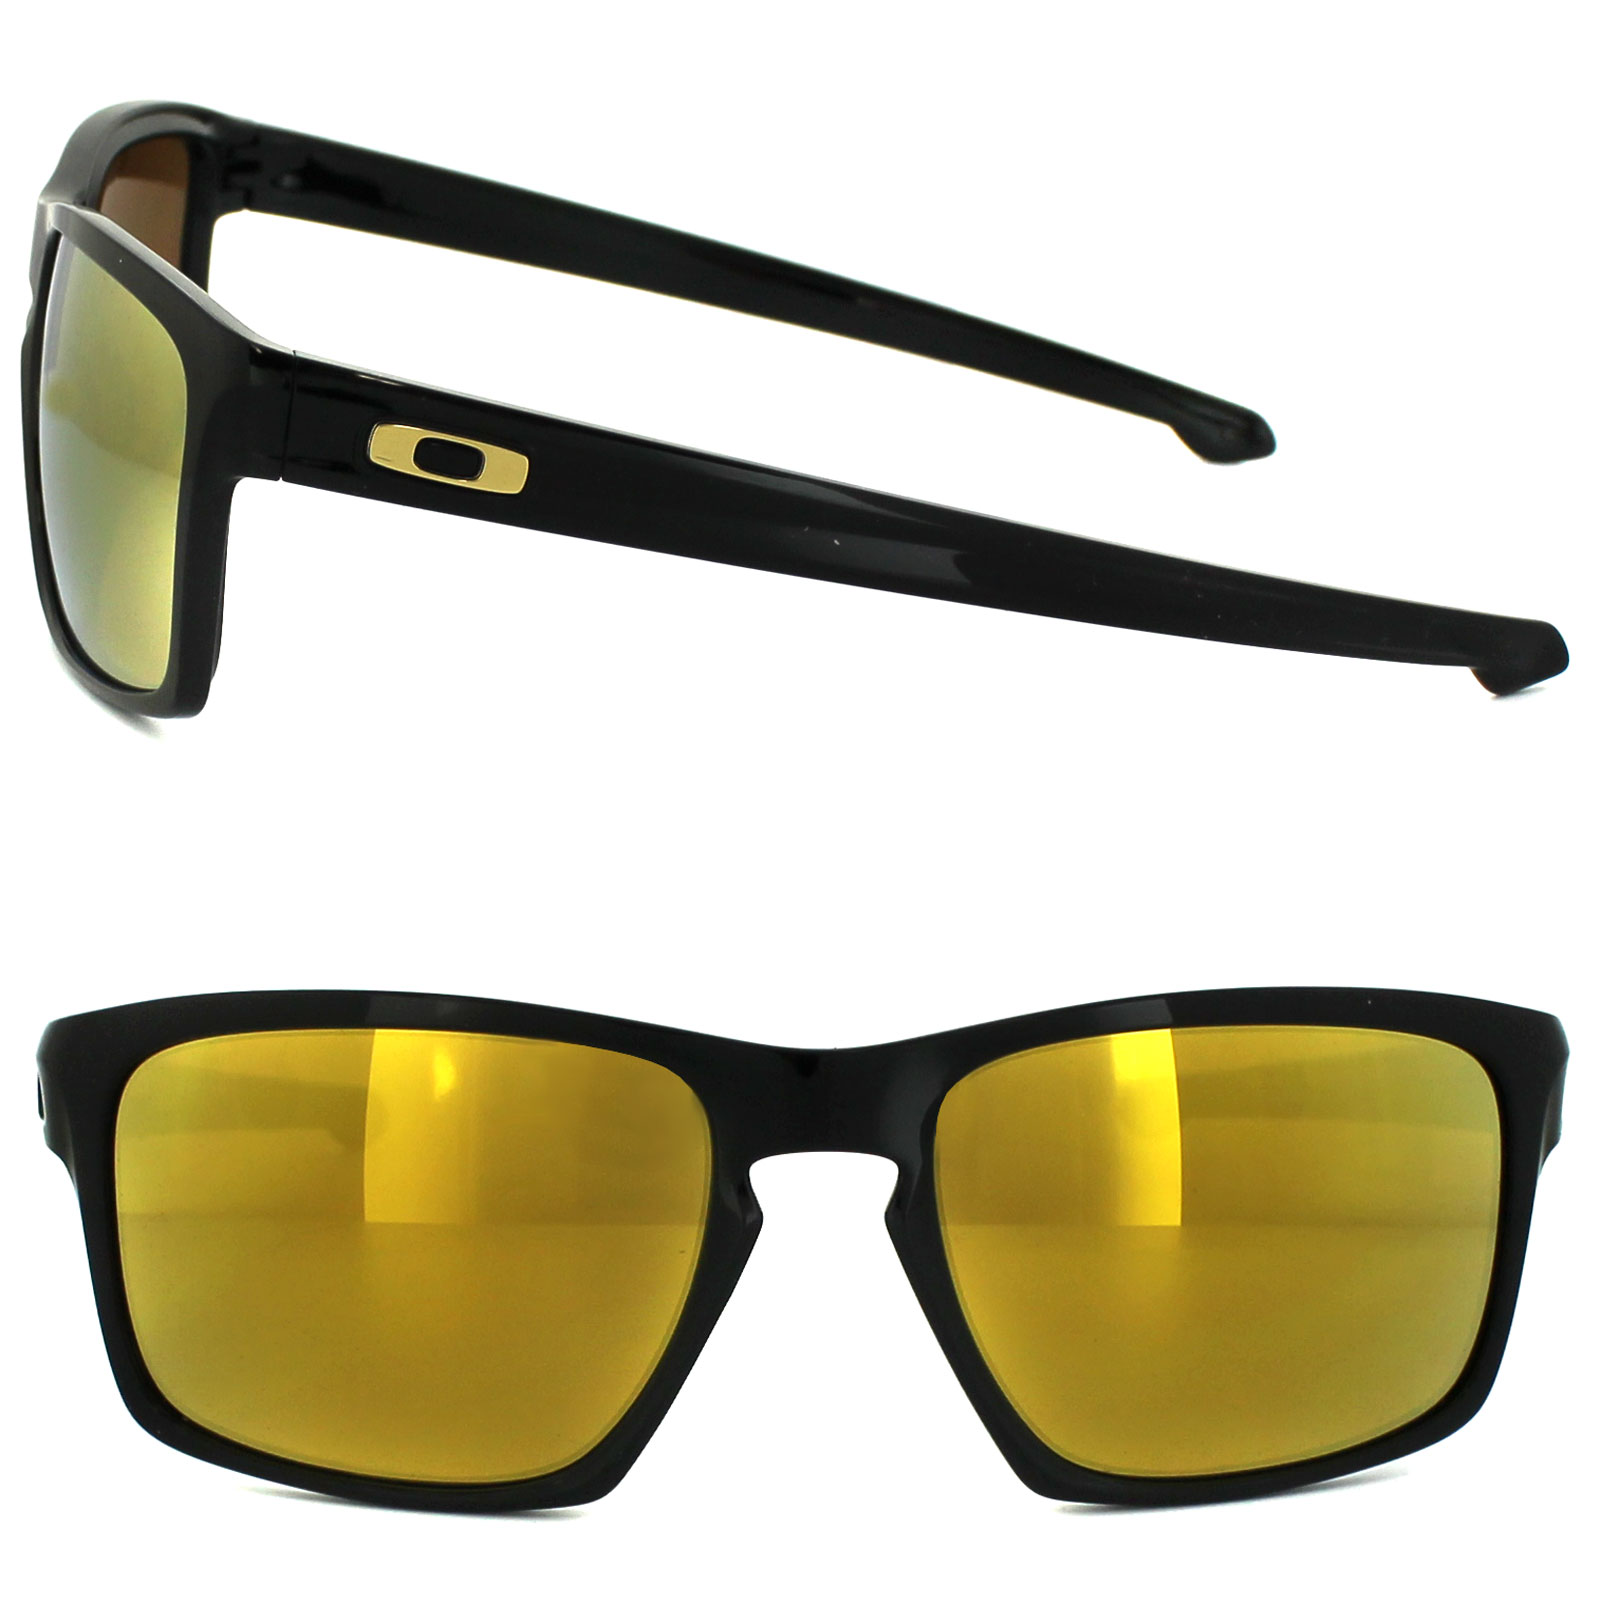 d630fd1931 Oakley Sliver Sunglasses Thumbnail 1 Oakley Sliver Sunglasses Thumbnail 2  ...